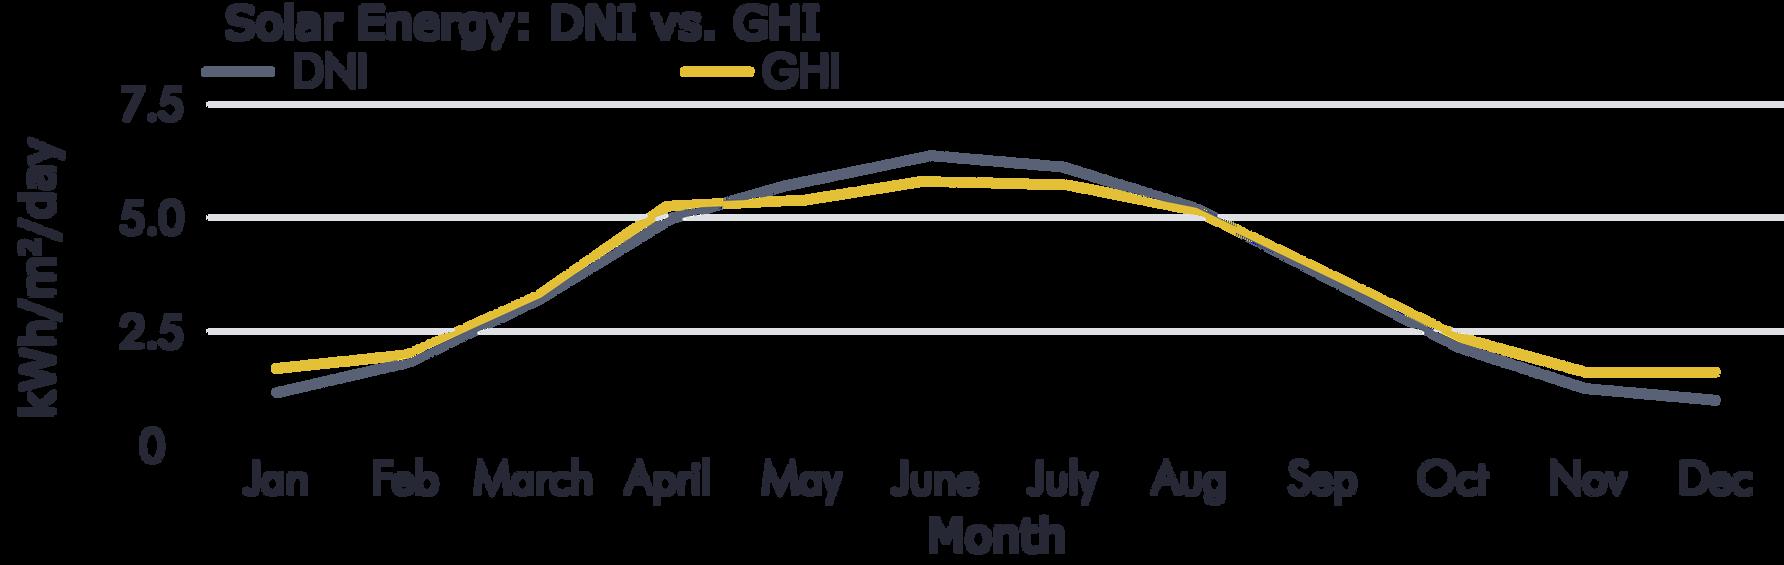 Average Solar Energy Gain Comparison Chart